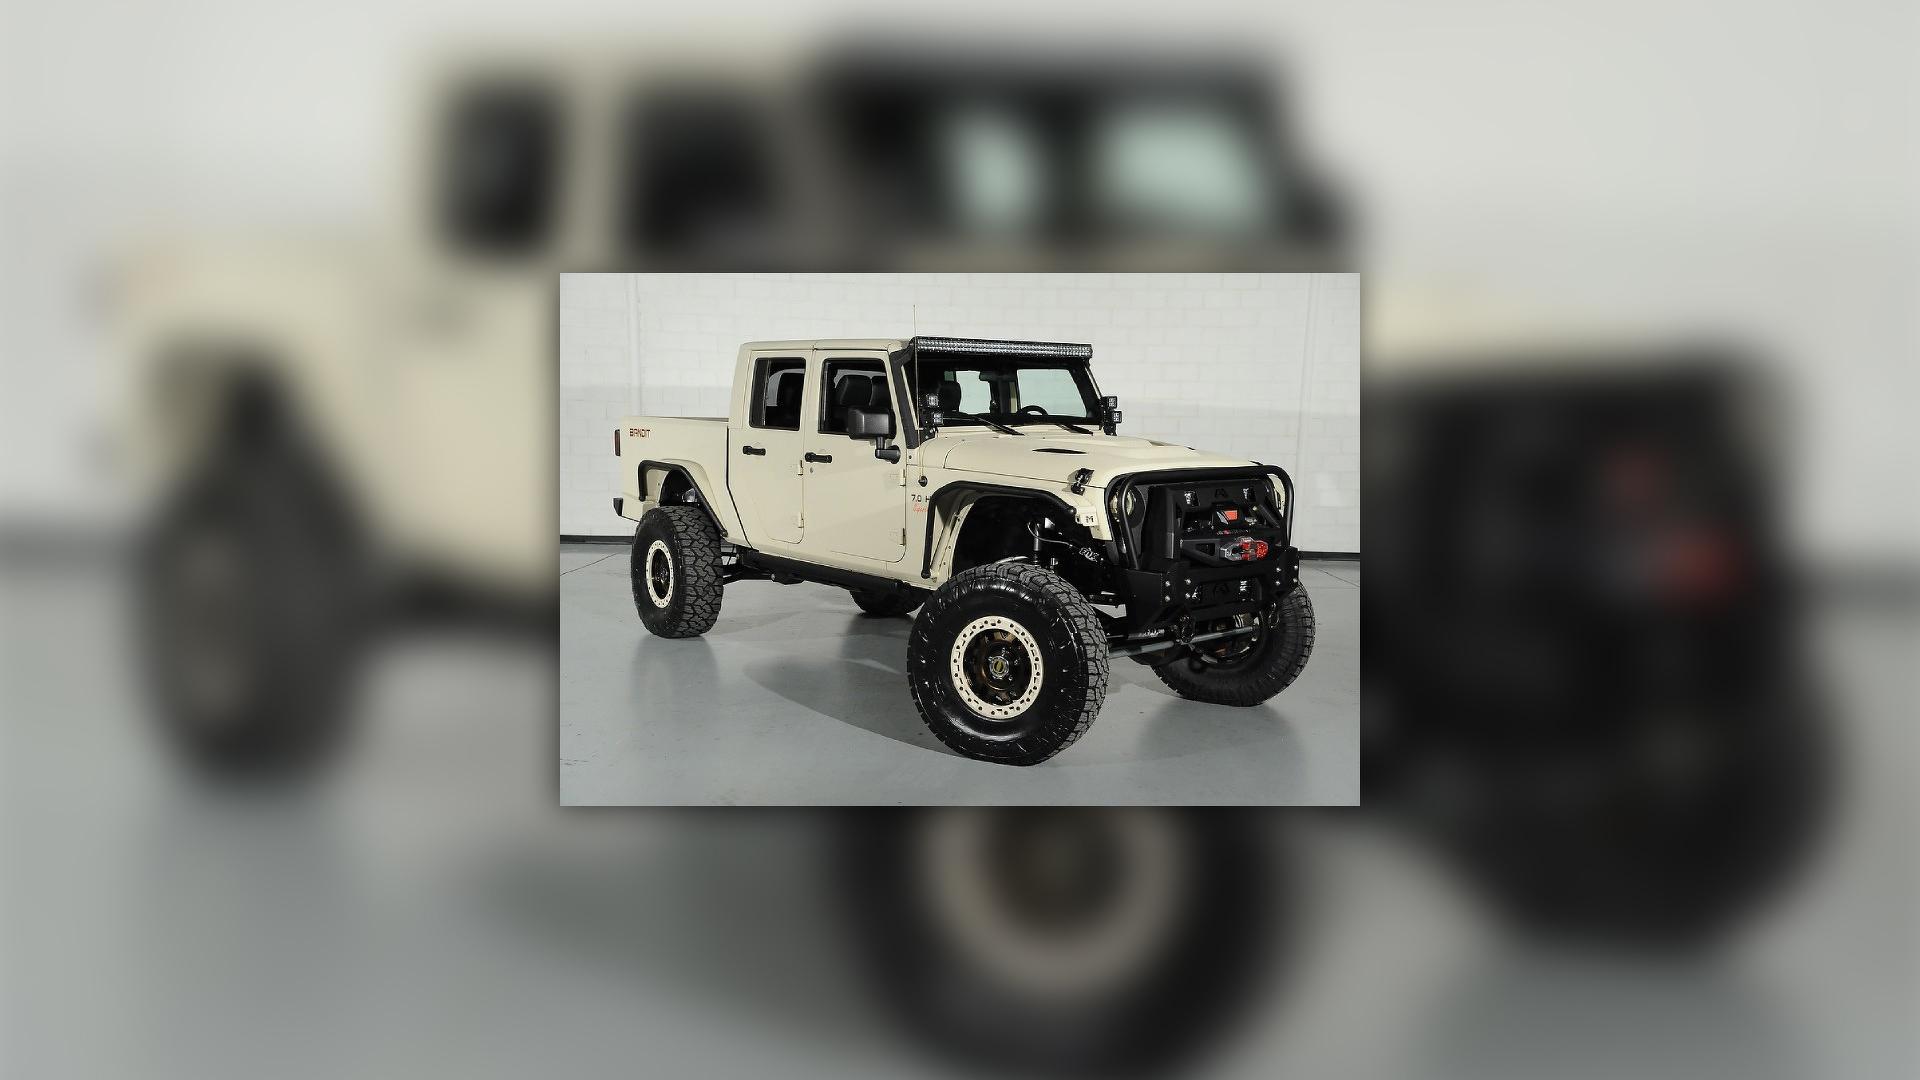 2018 jeep bandit. Perfect Jeep Inside 2018 Jeep Bandit